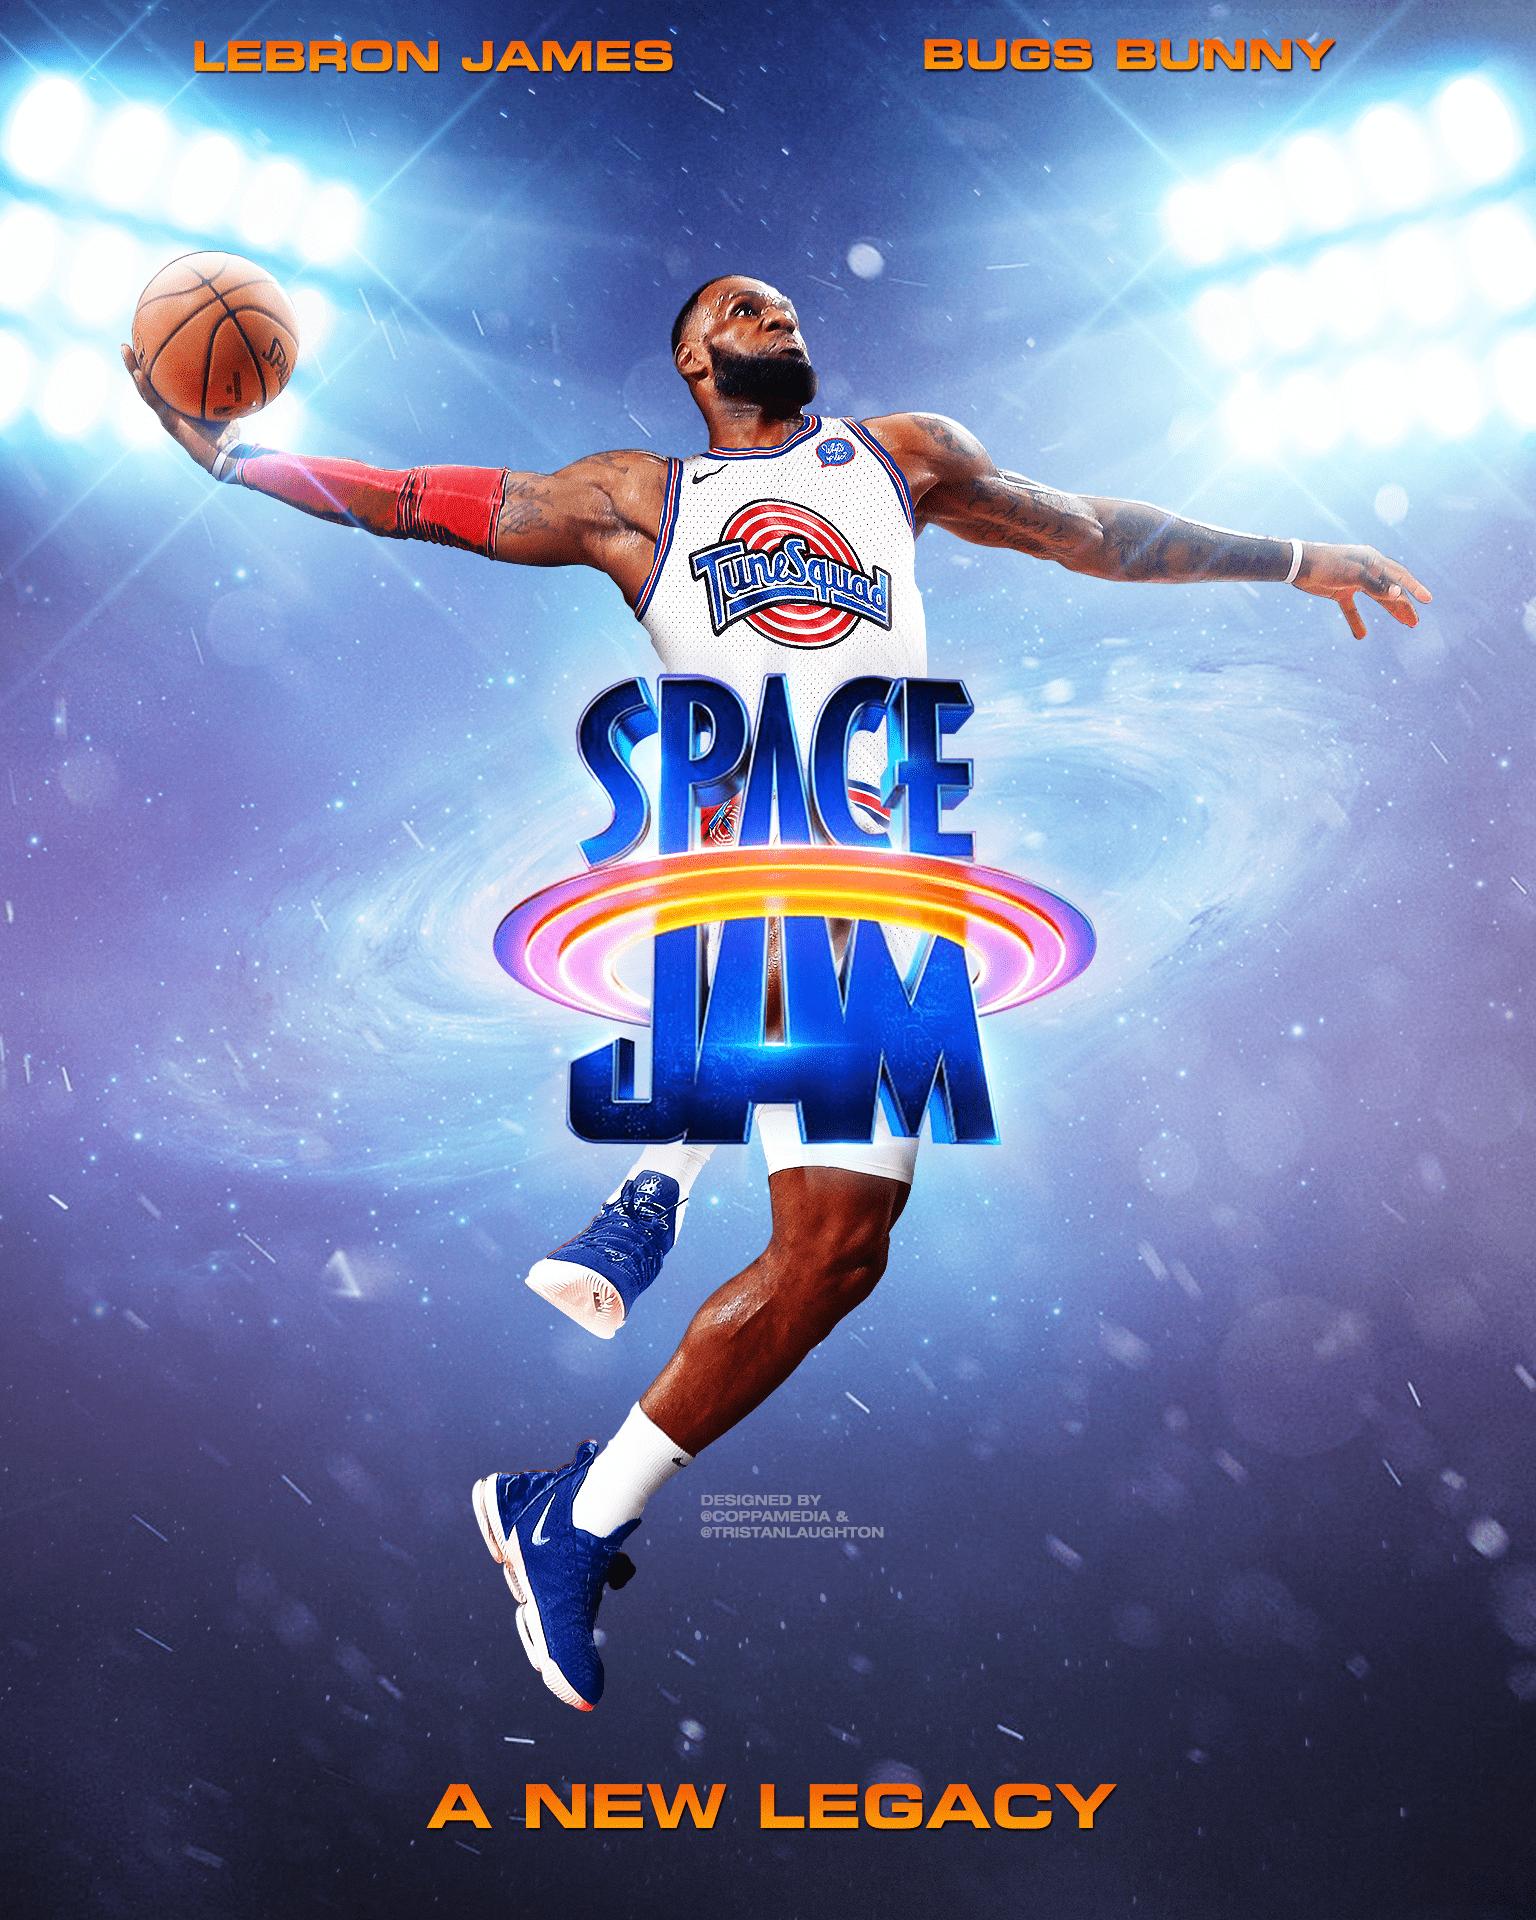 Space Jam Poster Design | Lebron james, Space jam, Lebron james poster